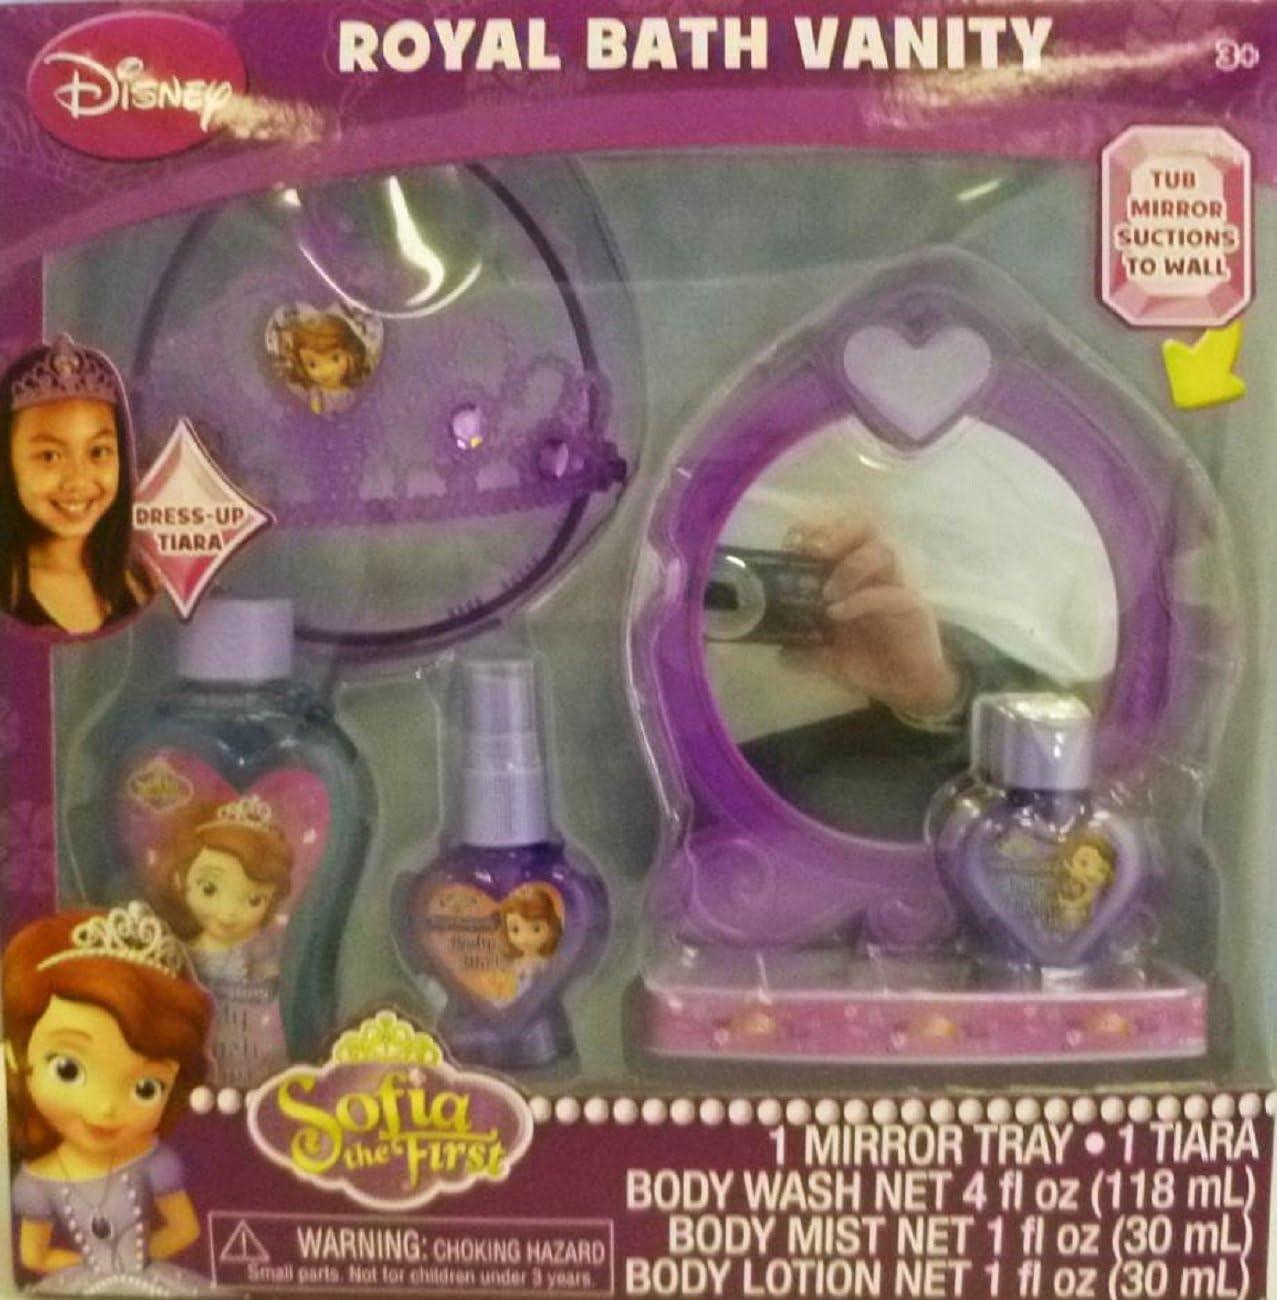 Disney Sofia the Royal First supreme Max 59% OFF Vanity